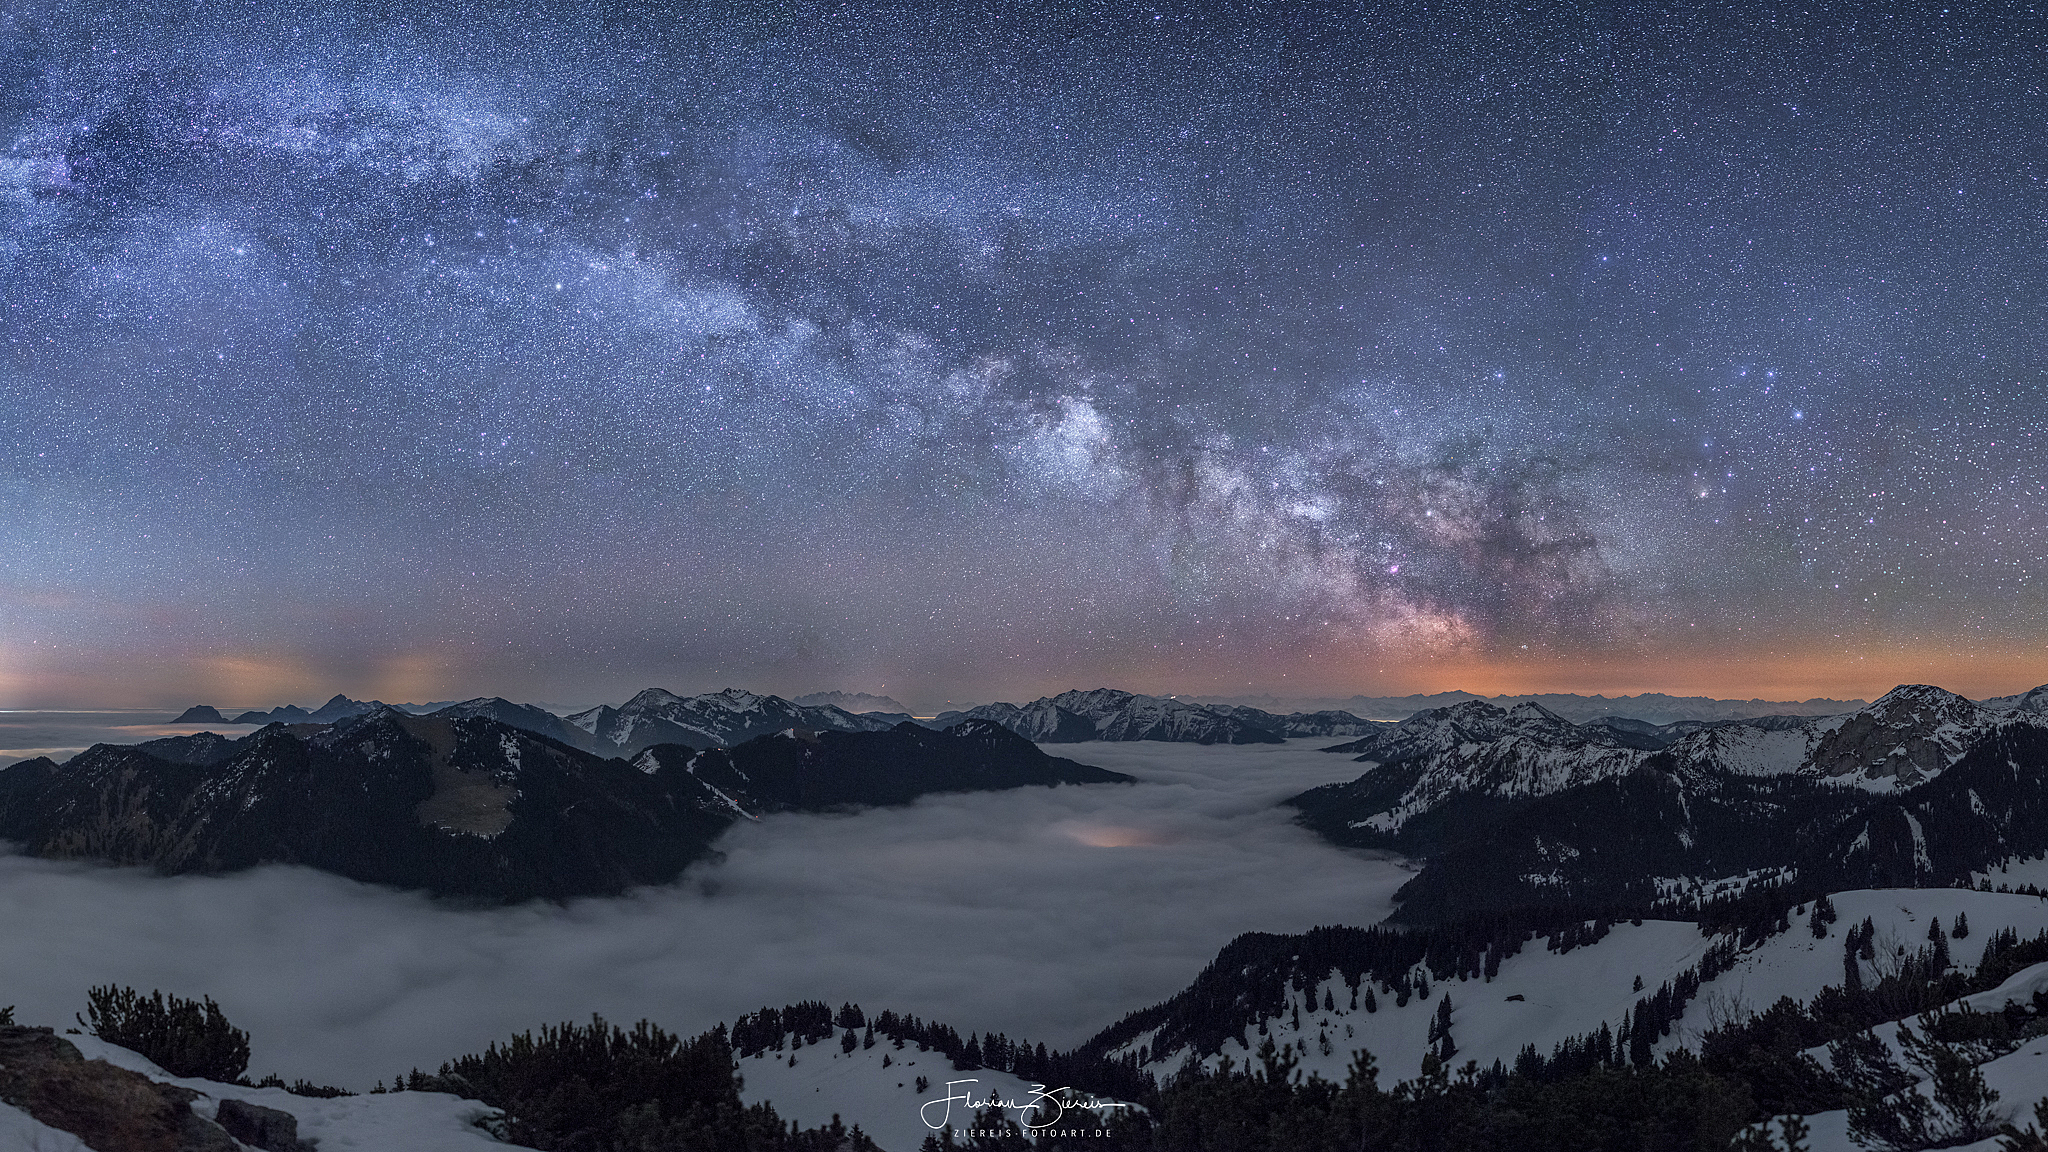 Sterne und Nachtlandschaften – Ziereis-Fotoart.de